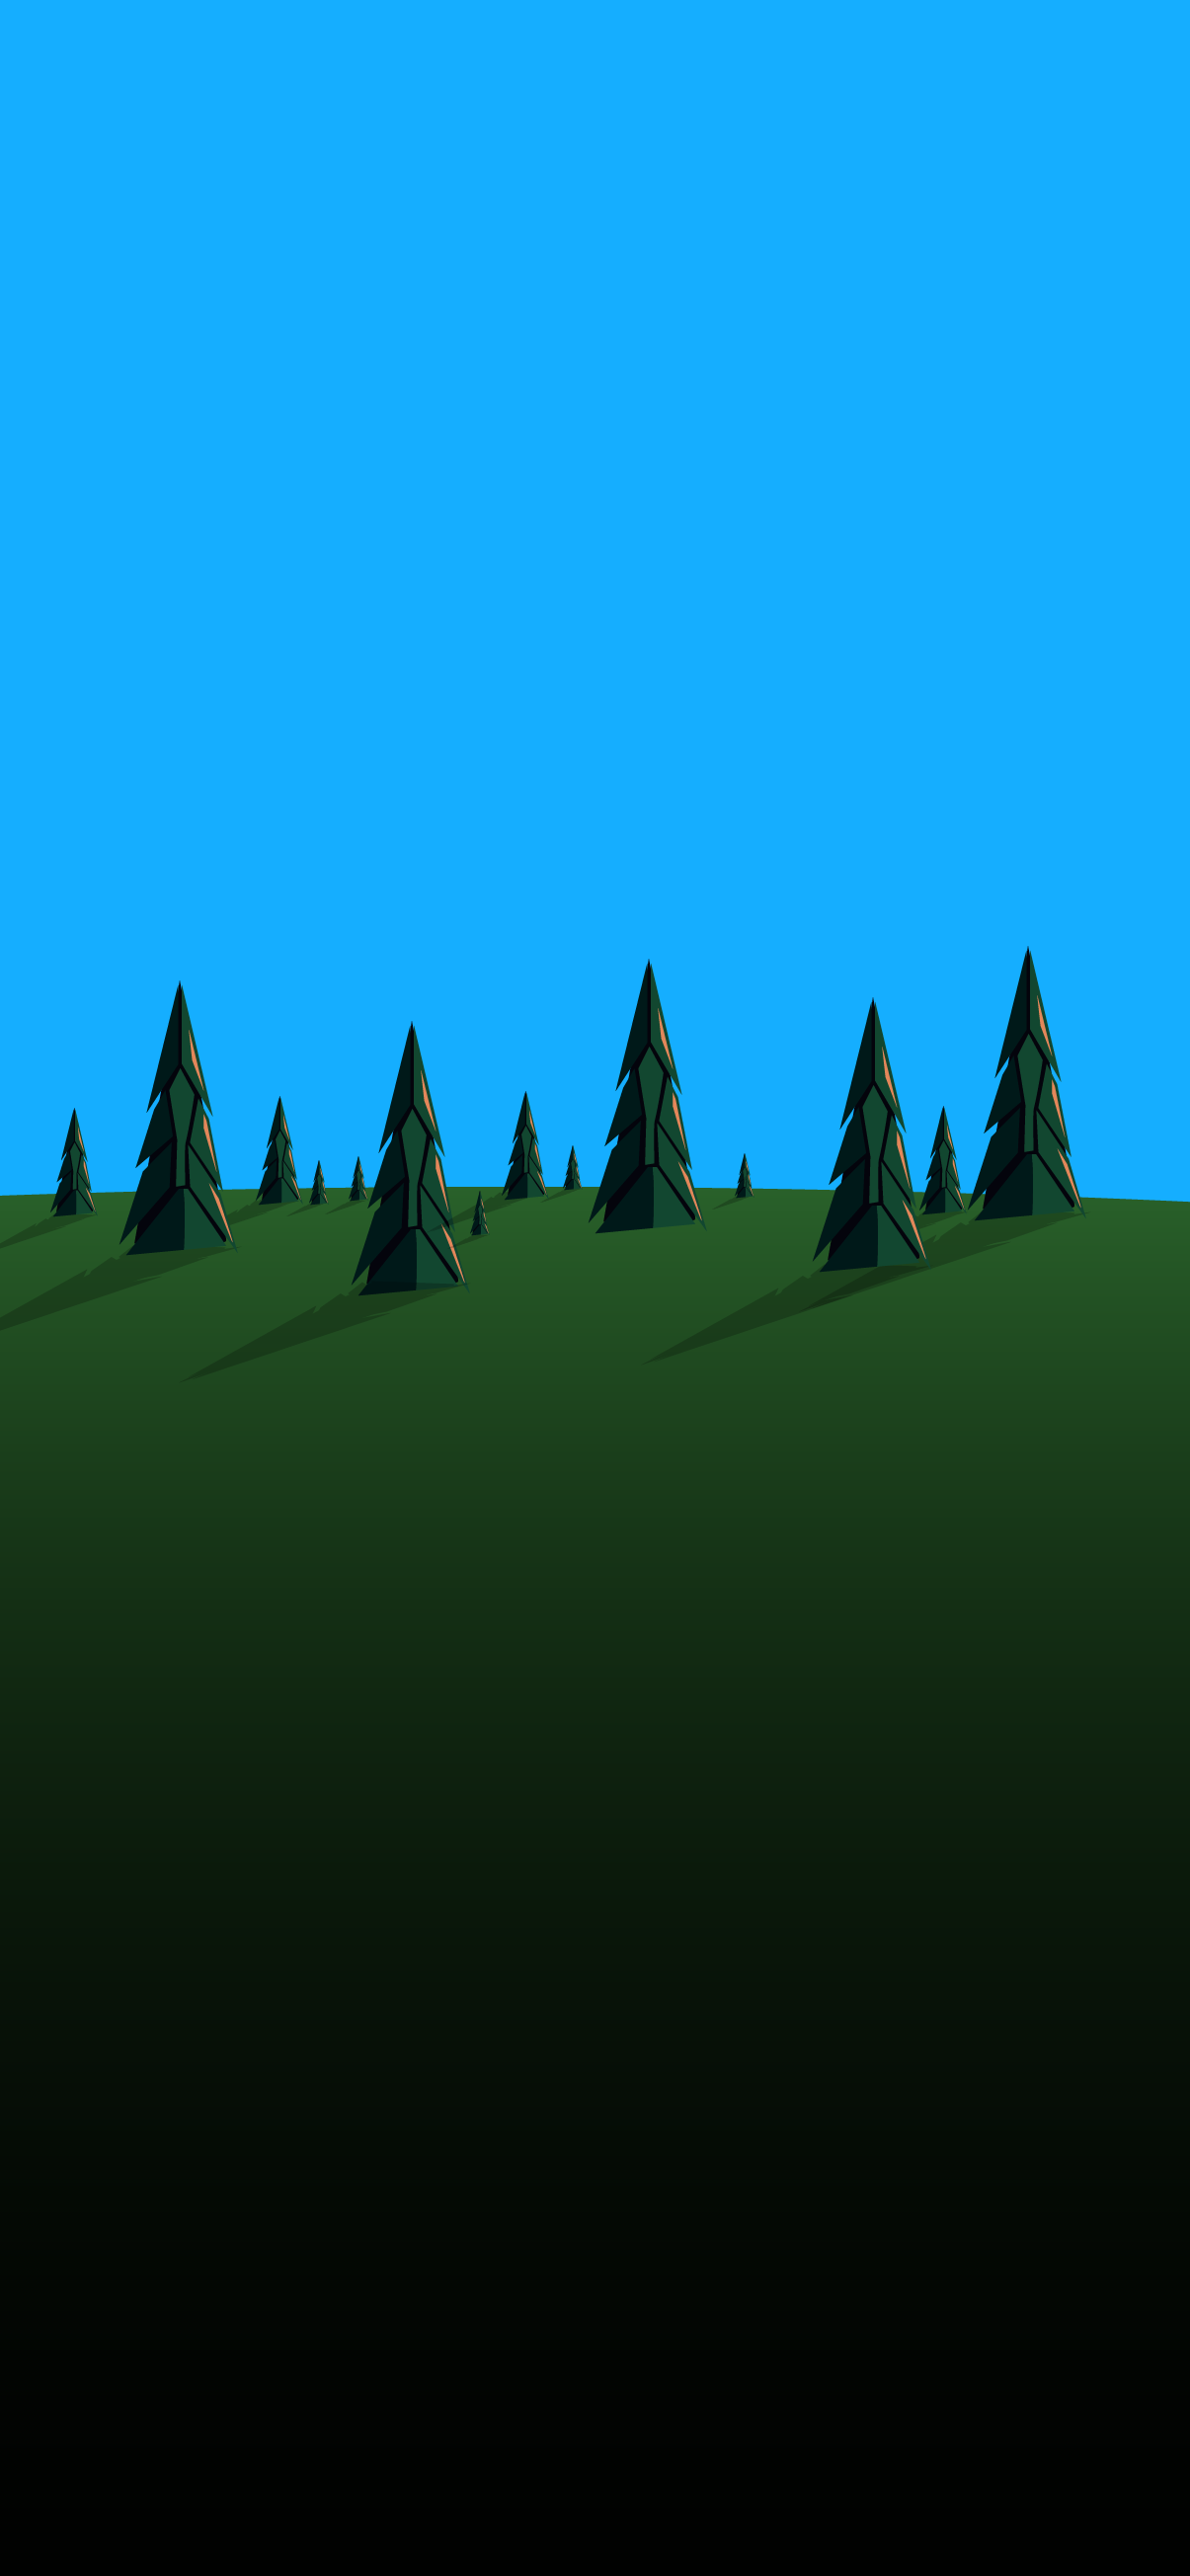 minimalist forest day wallpaper 4k